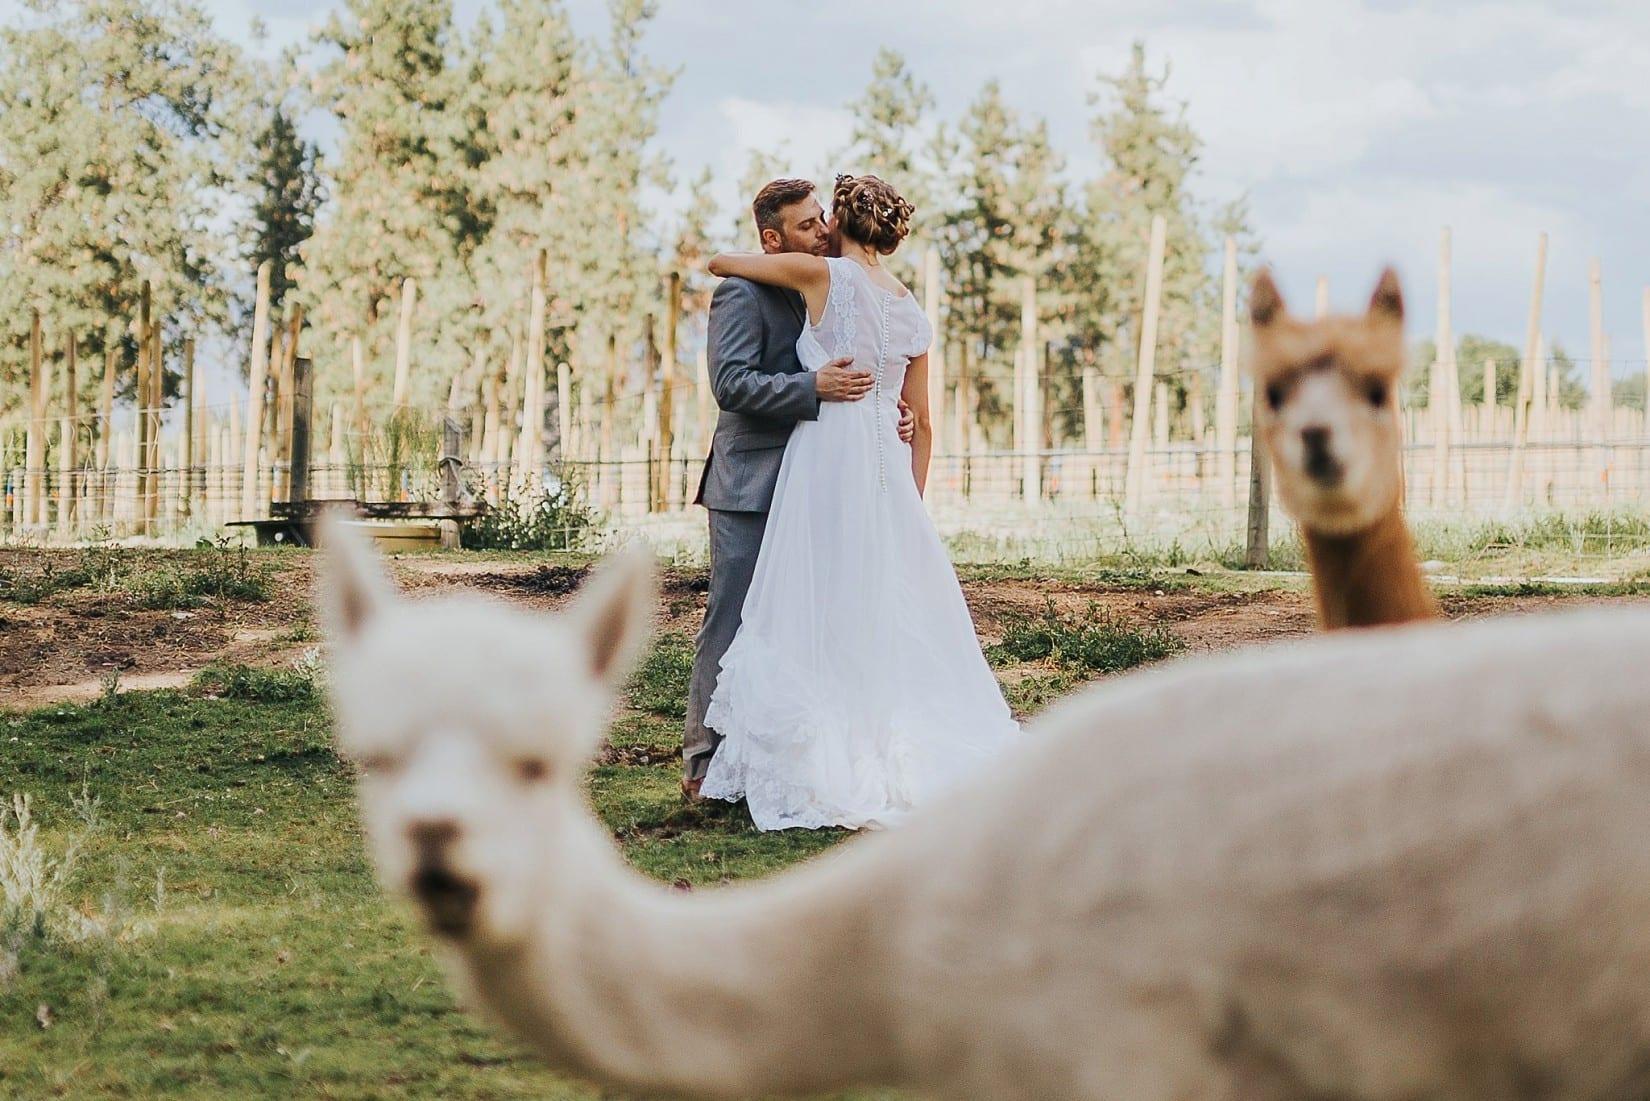 Bottega Farm Inn Wedding Kelowna BC Photographer Alpacas